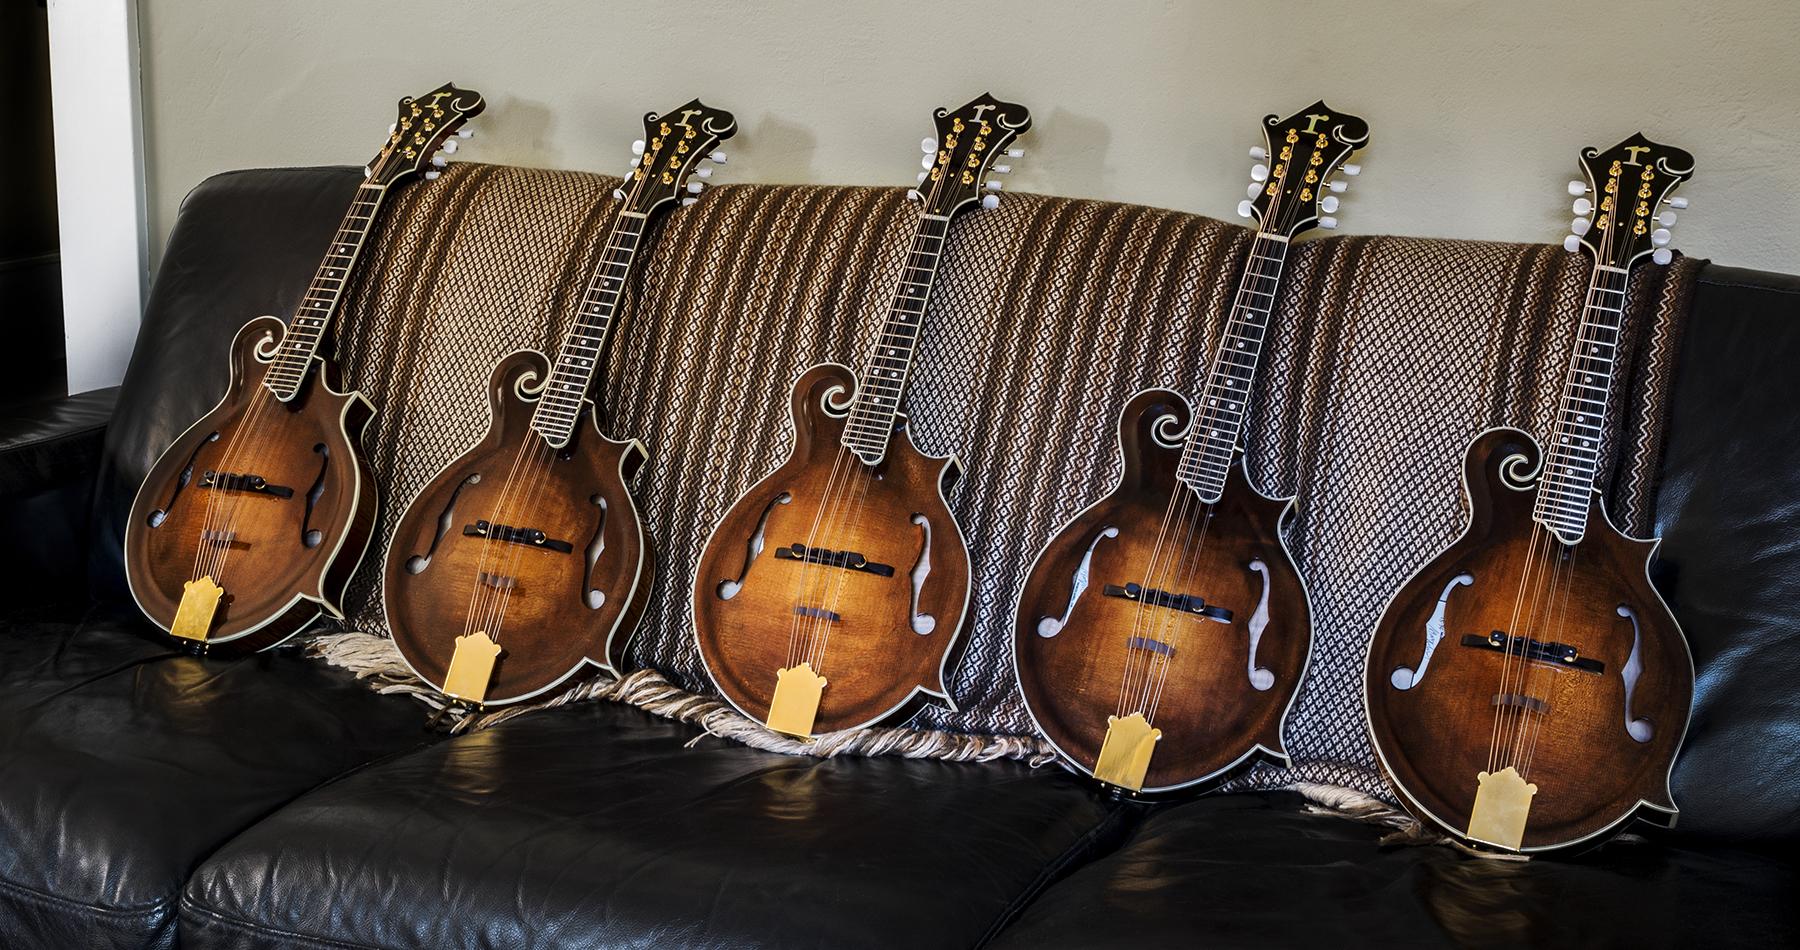 Matt Ruhland's latest batch of F5 mandolins.